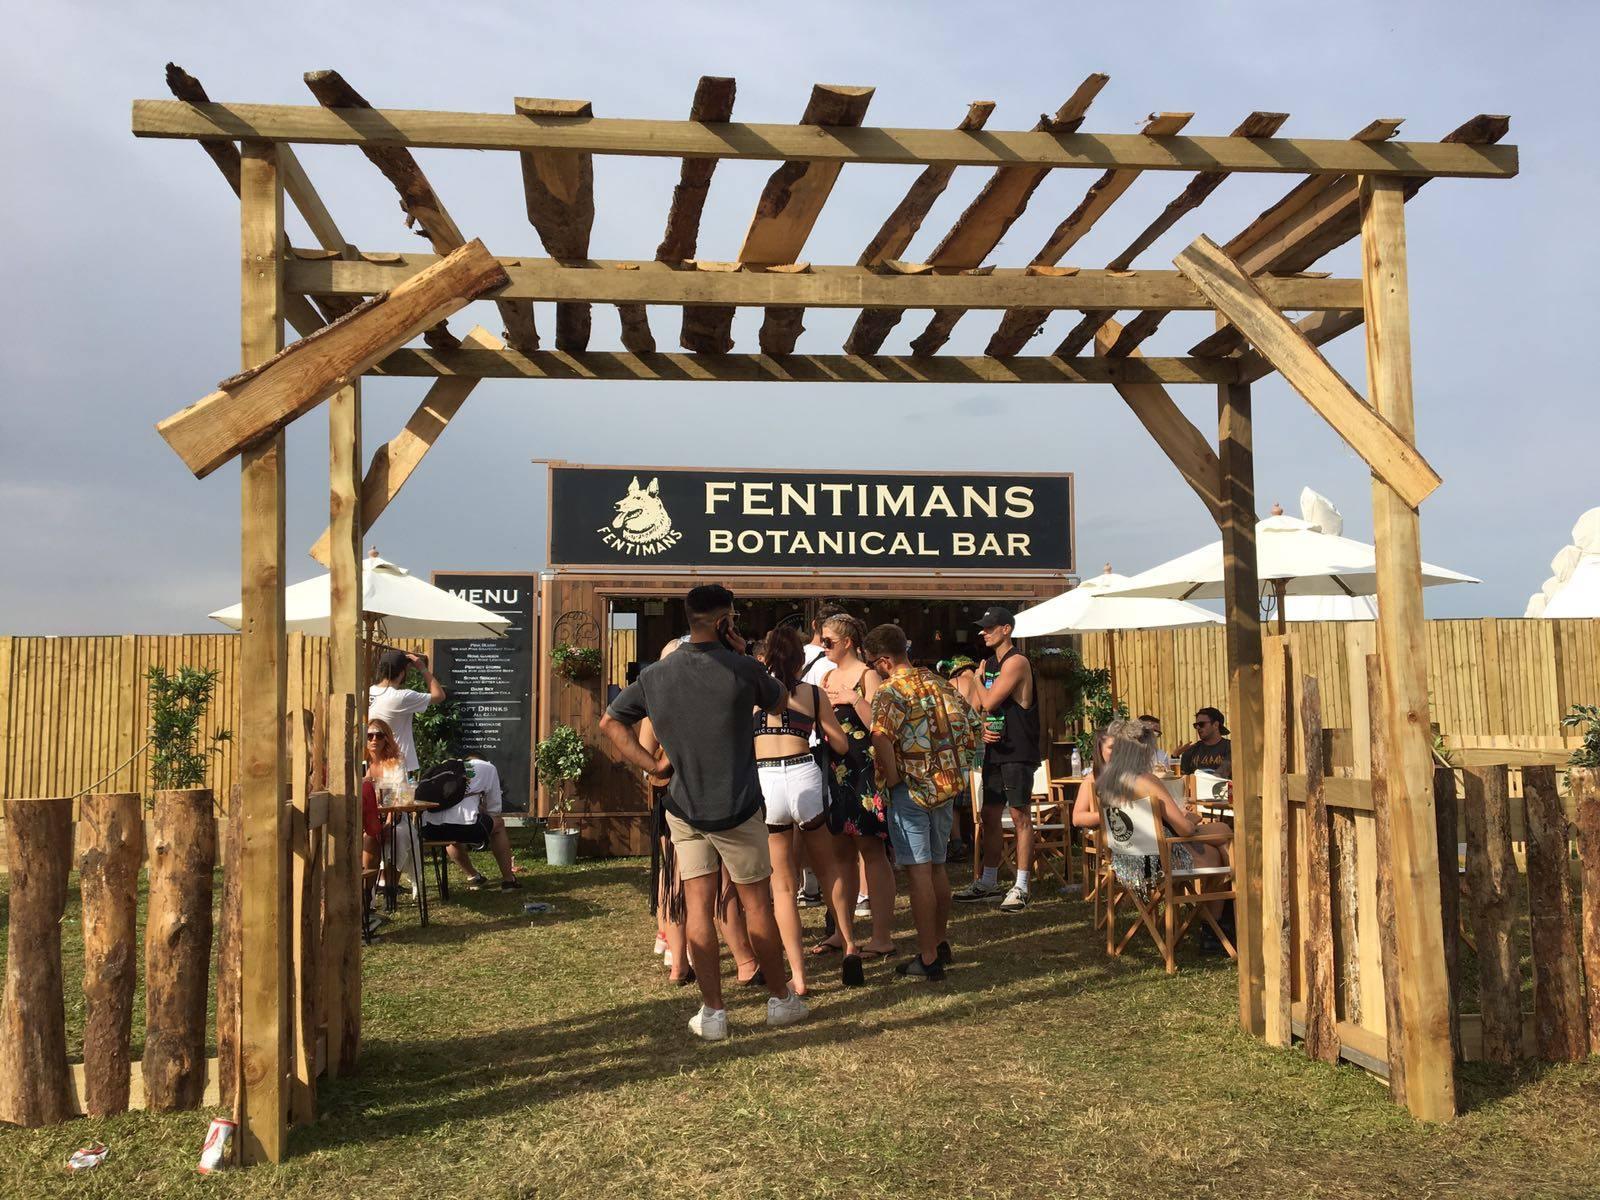 The Fentimans Botanical Bar we designed and built last year, at Lost Village Festival 2017